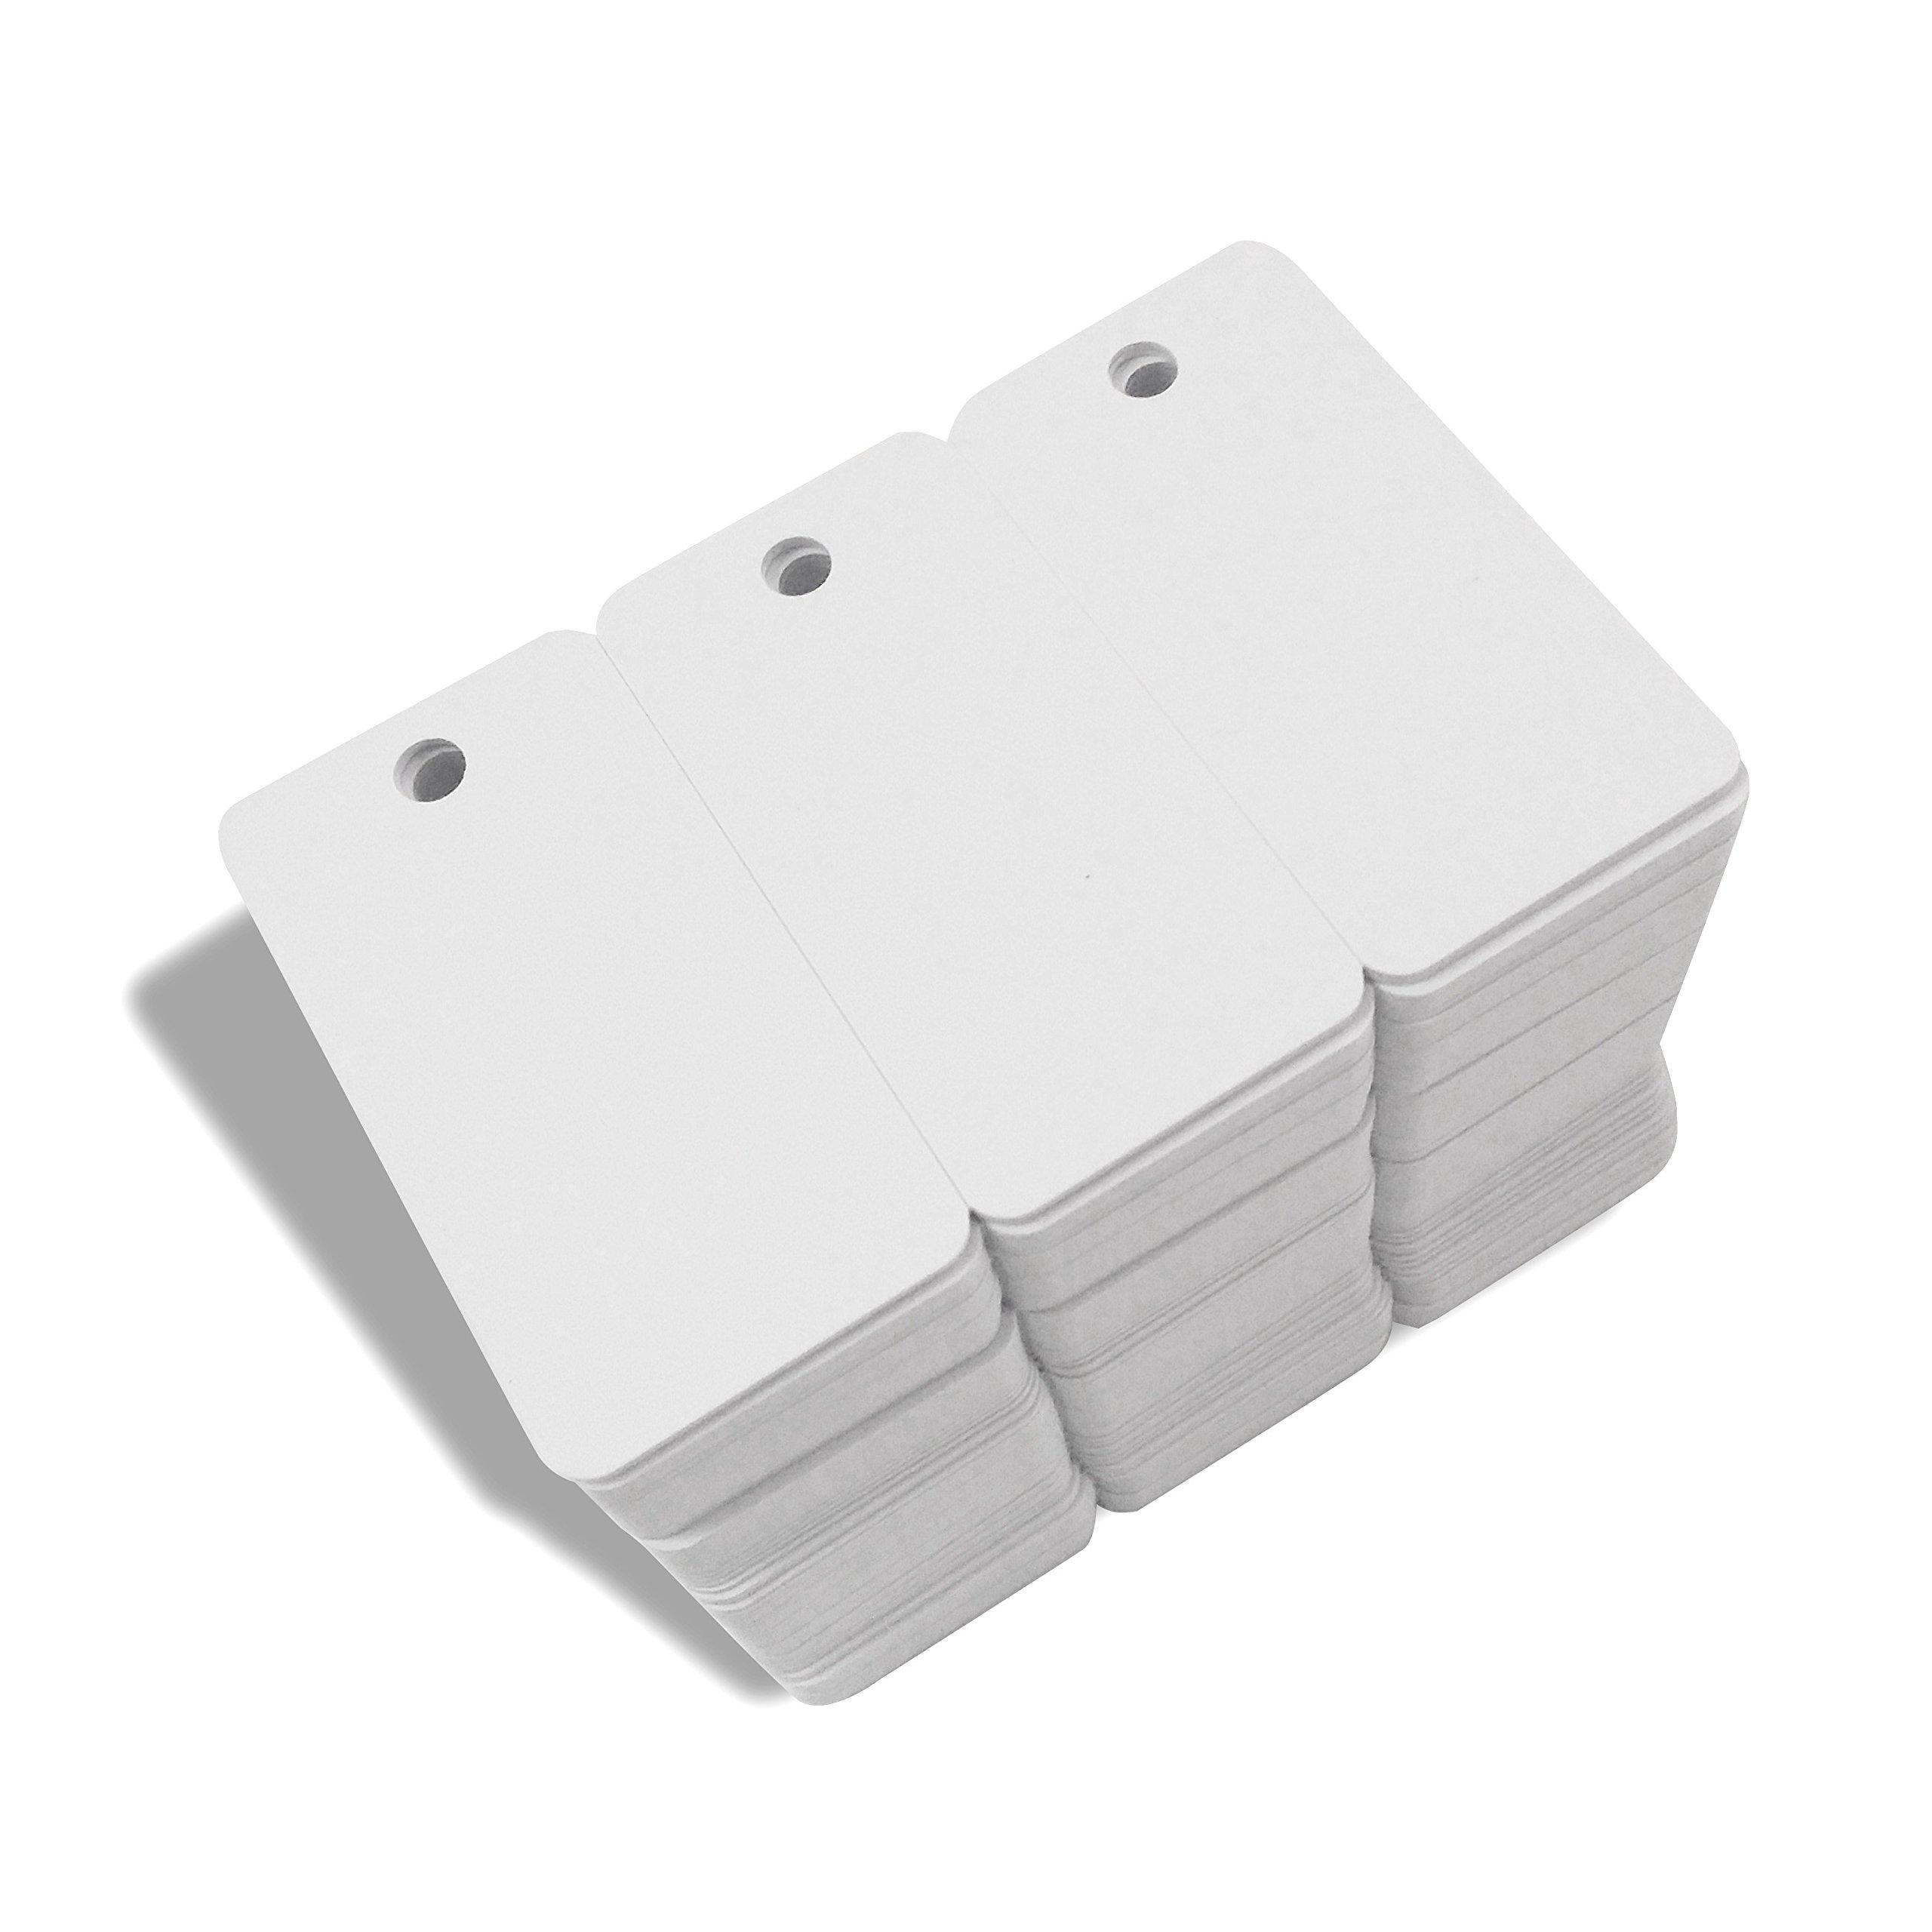 3-up Breakaway Key Tags, White Blank Inkjet PVC Cards CR80 30Mil Plasitc ID Cards (100)